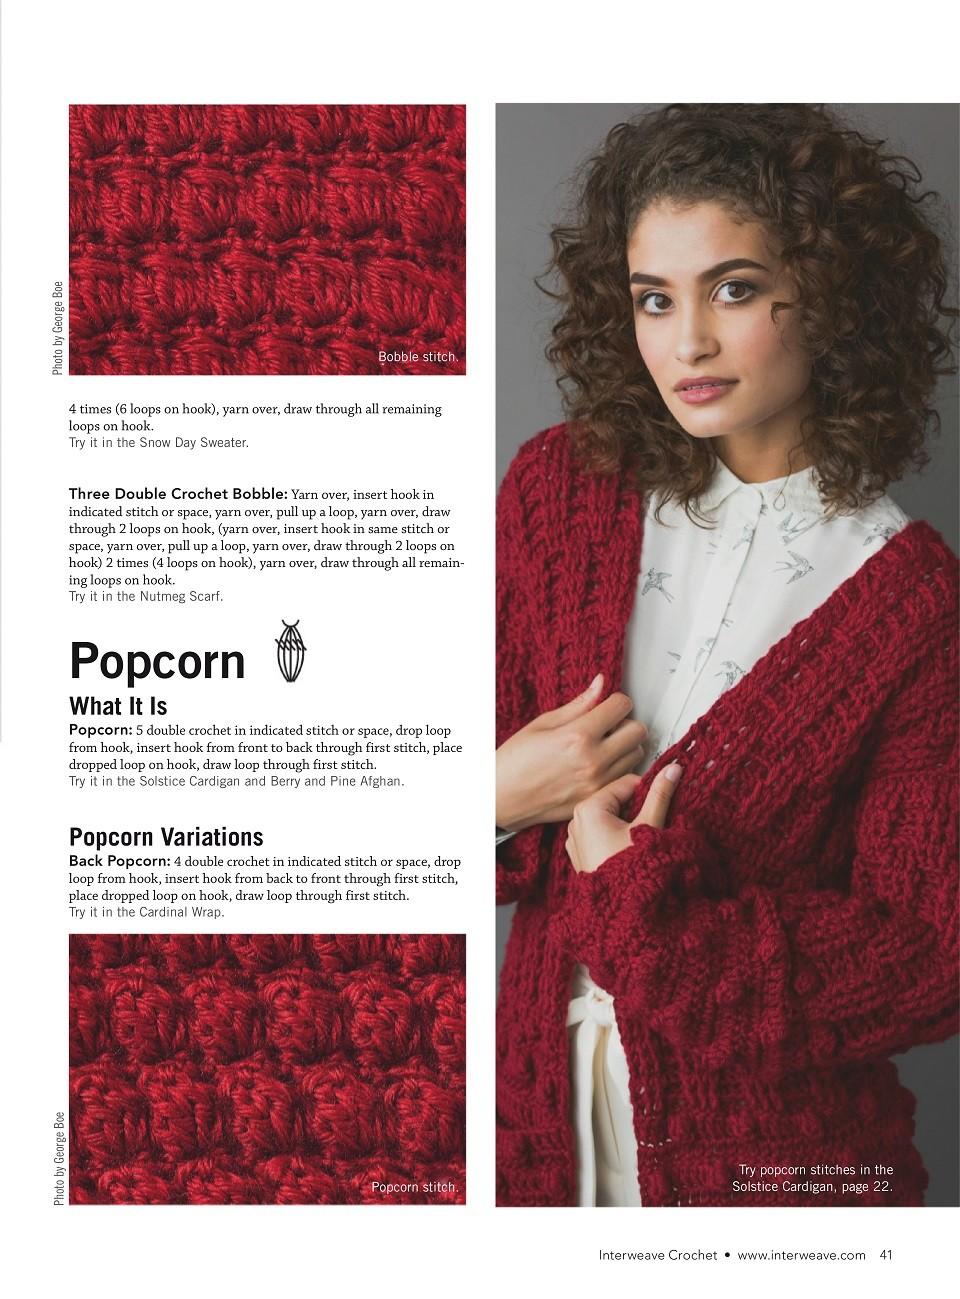 Interweave Crochet Winter 2019-42